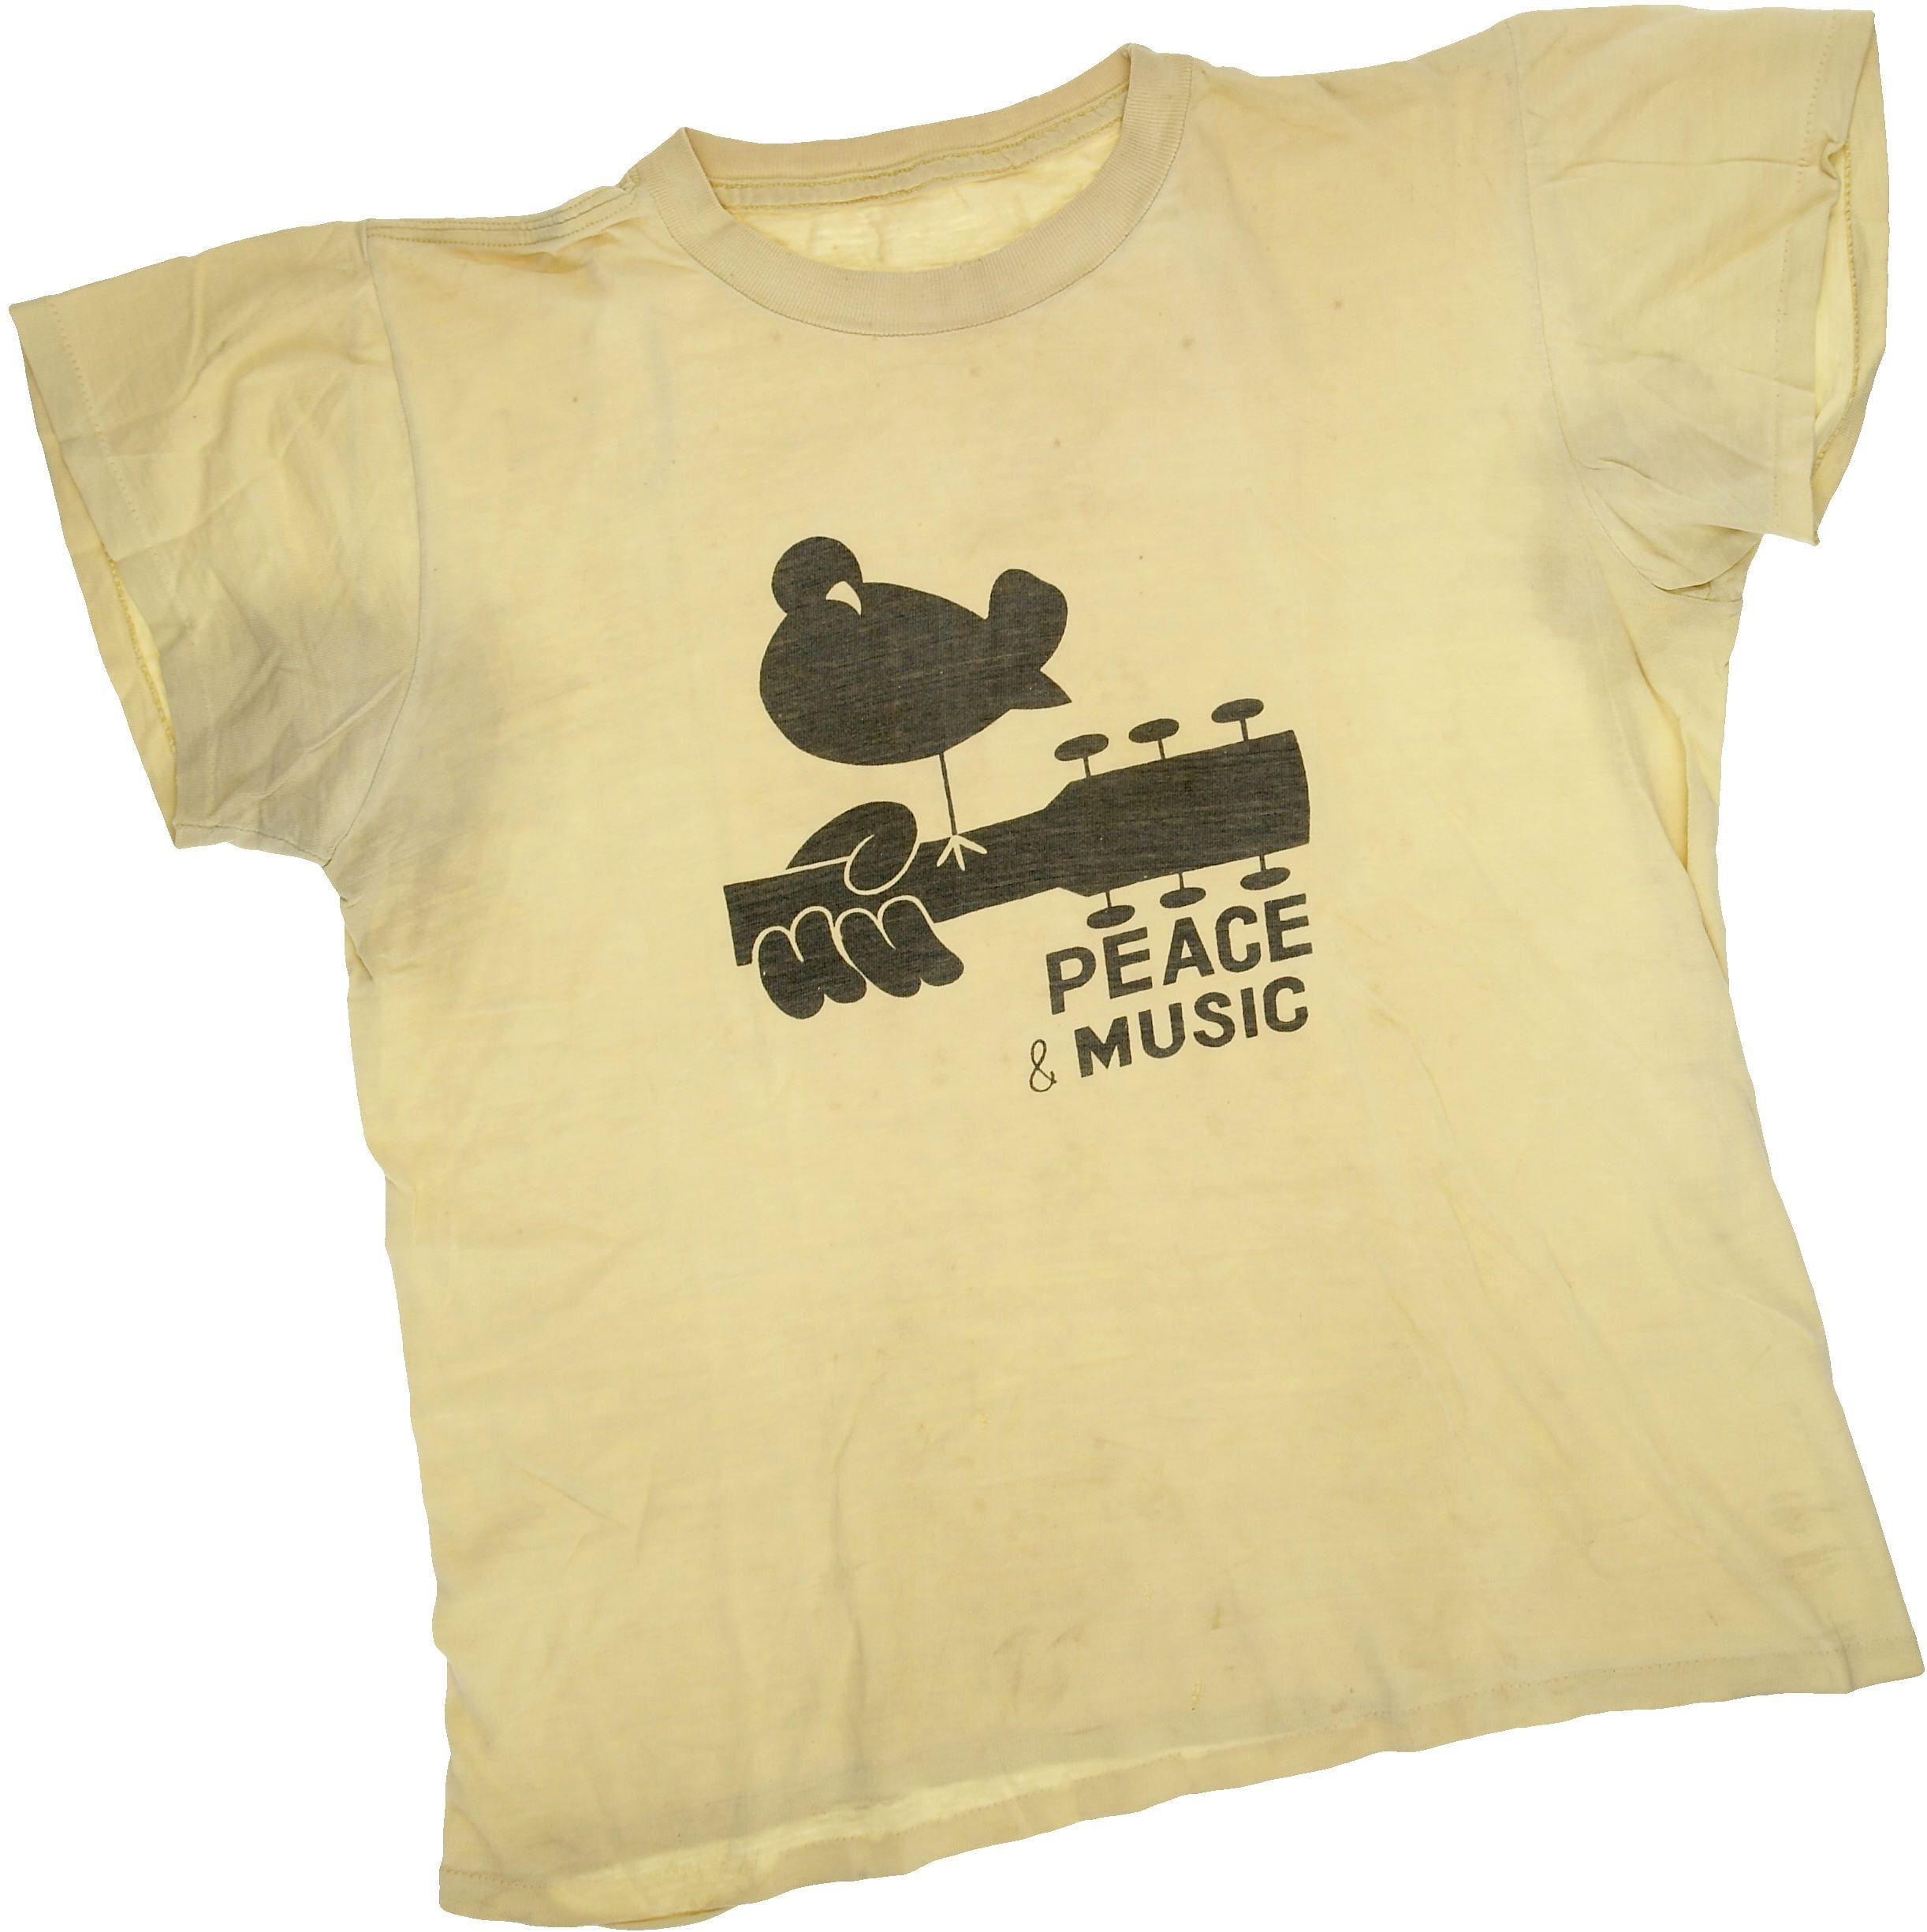 graham nash woodstock t-shirt